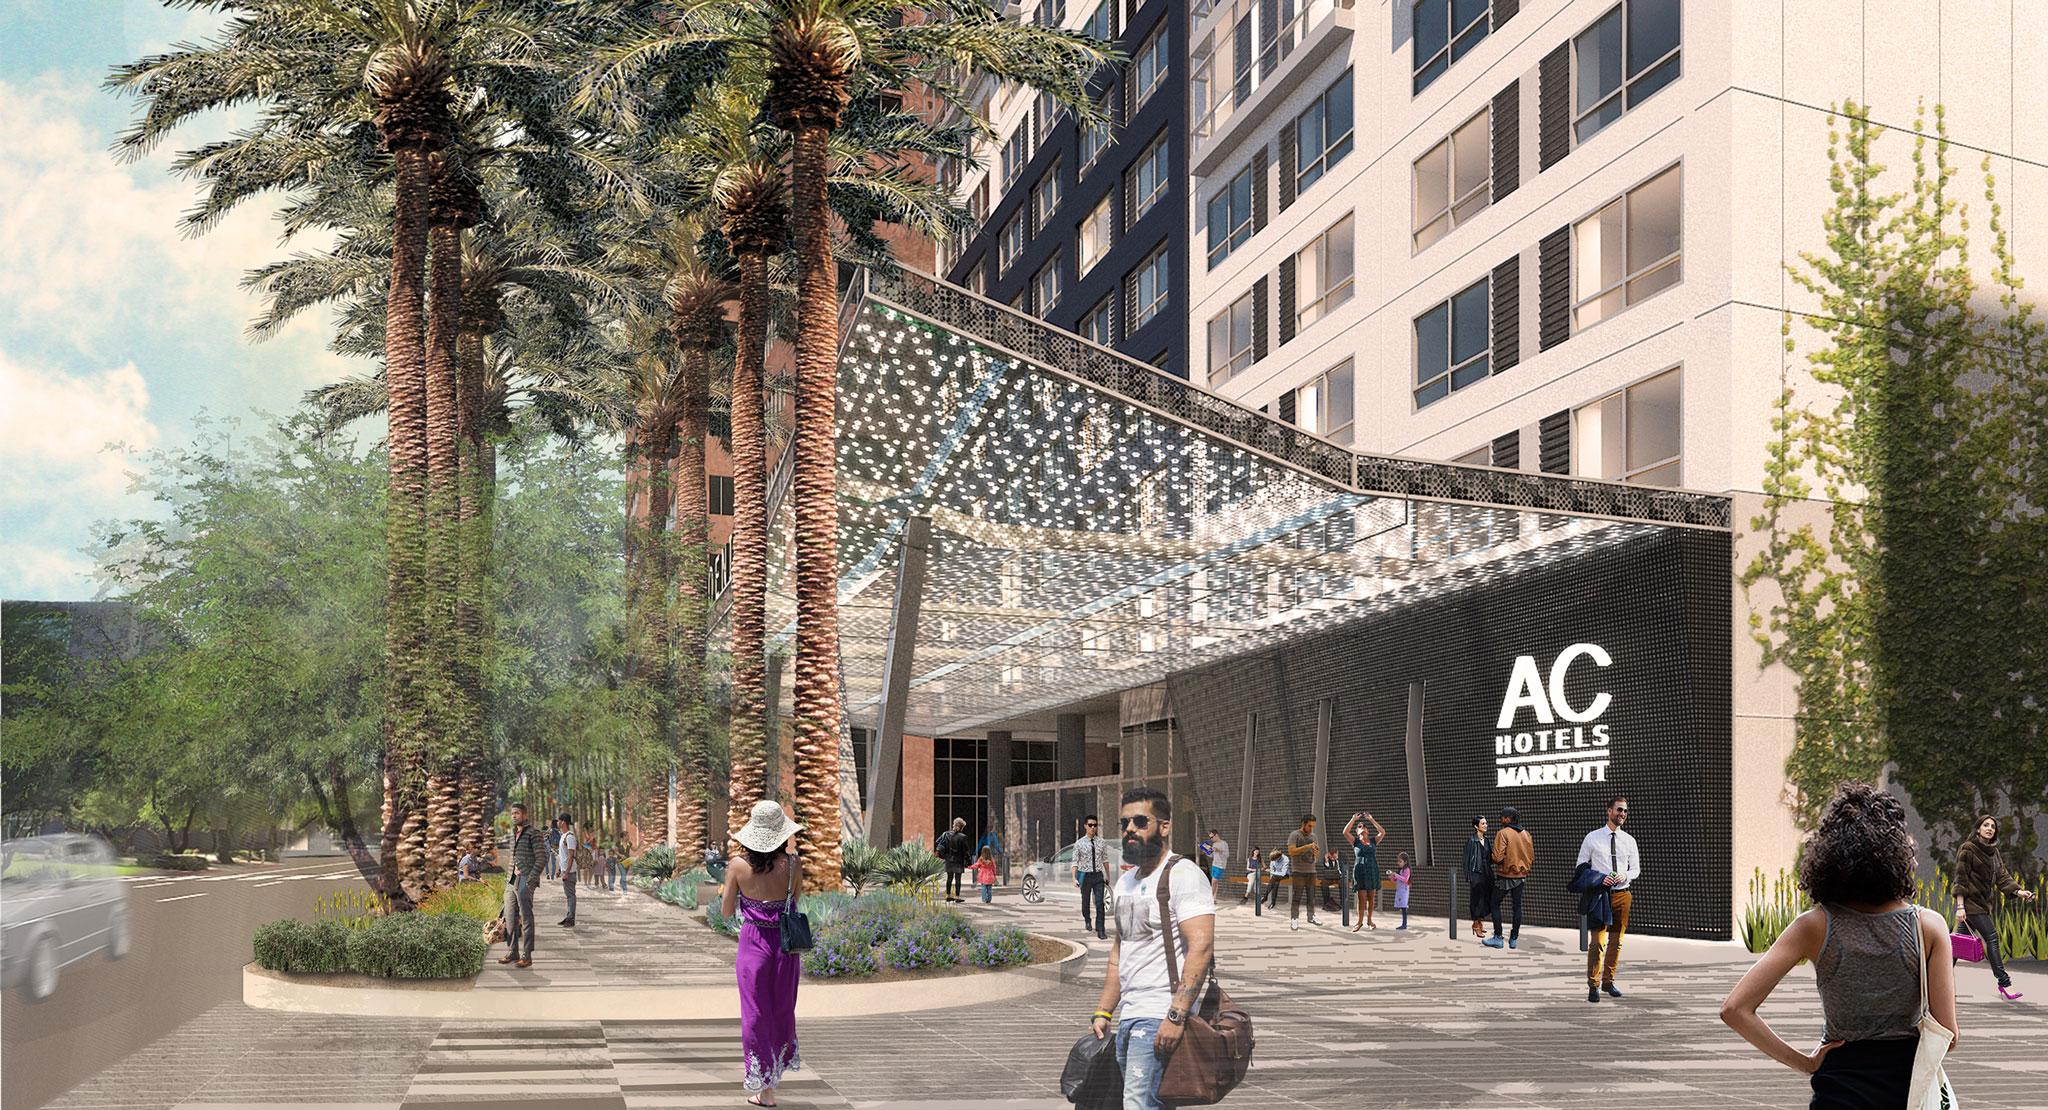 AC Mariott Hotel at Arizona Center